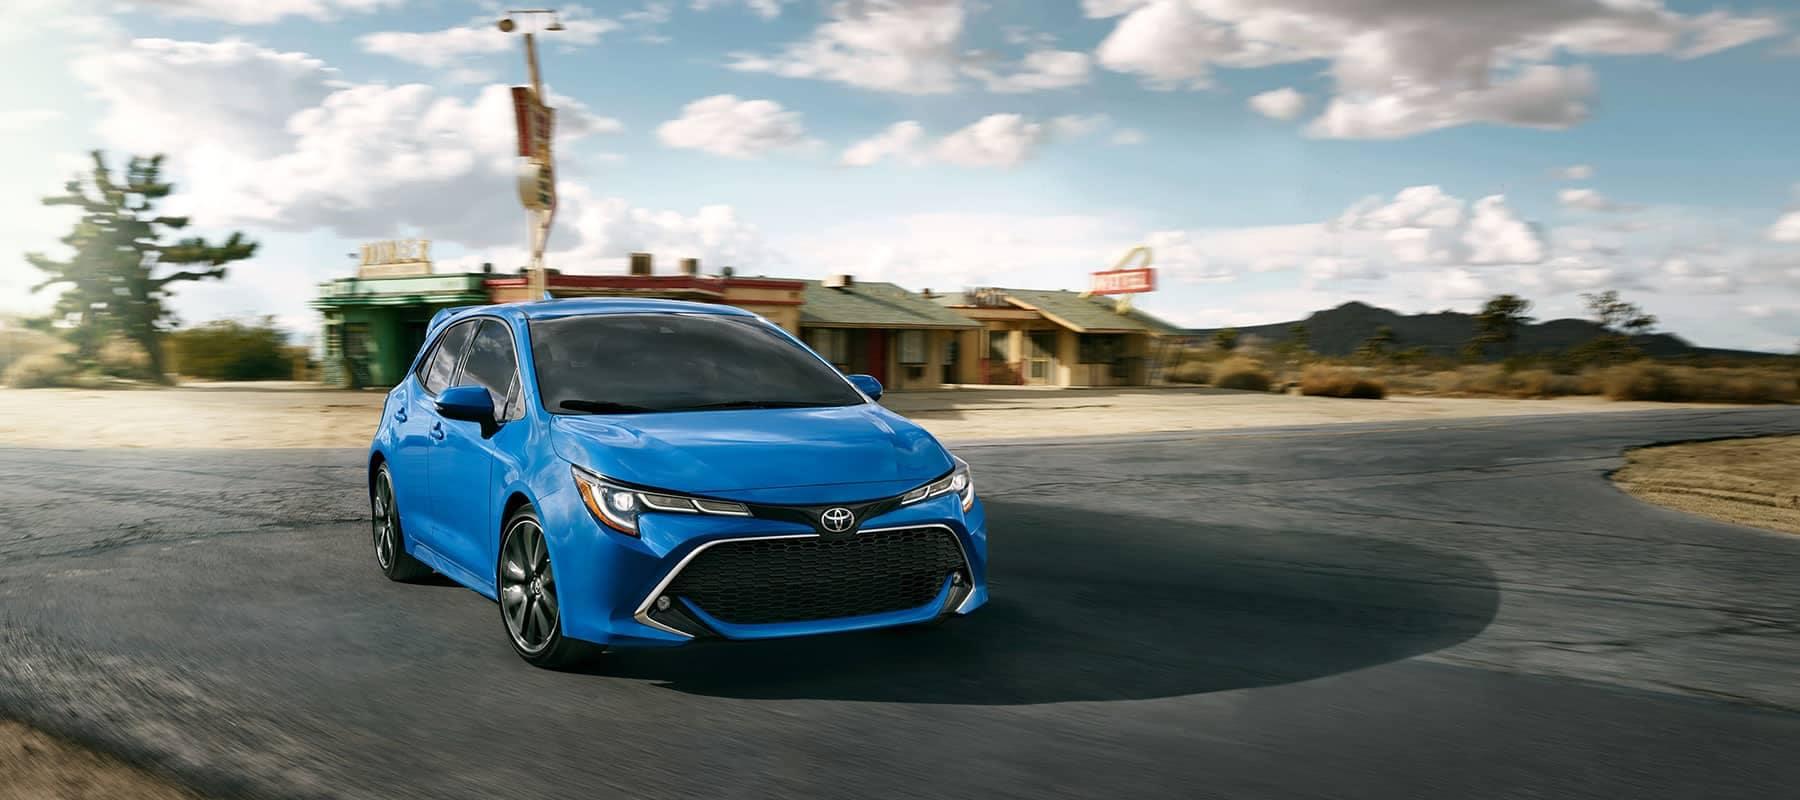 2019-Corolla-Hatchback blue vehicle